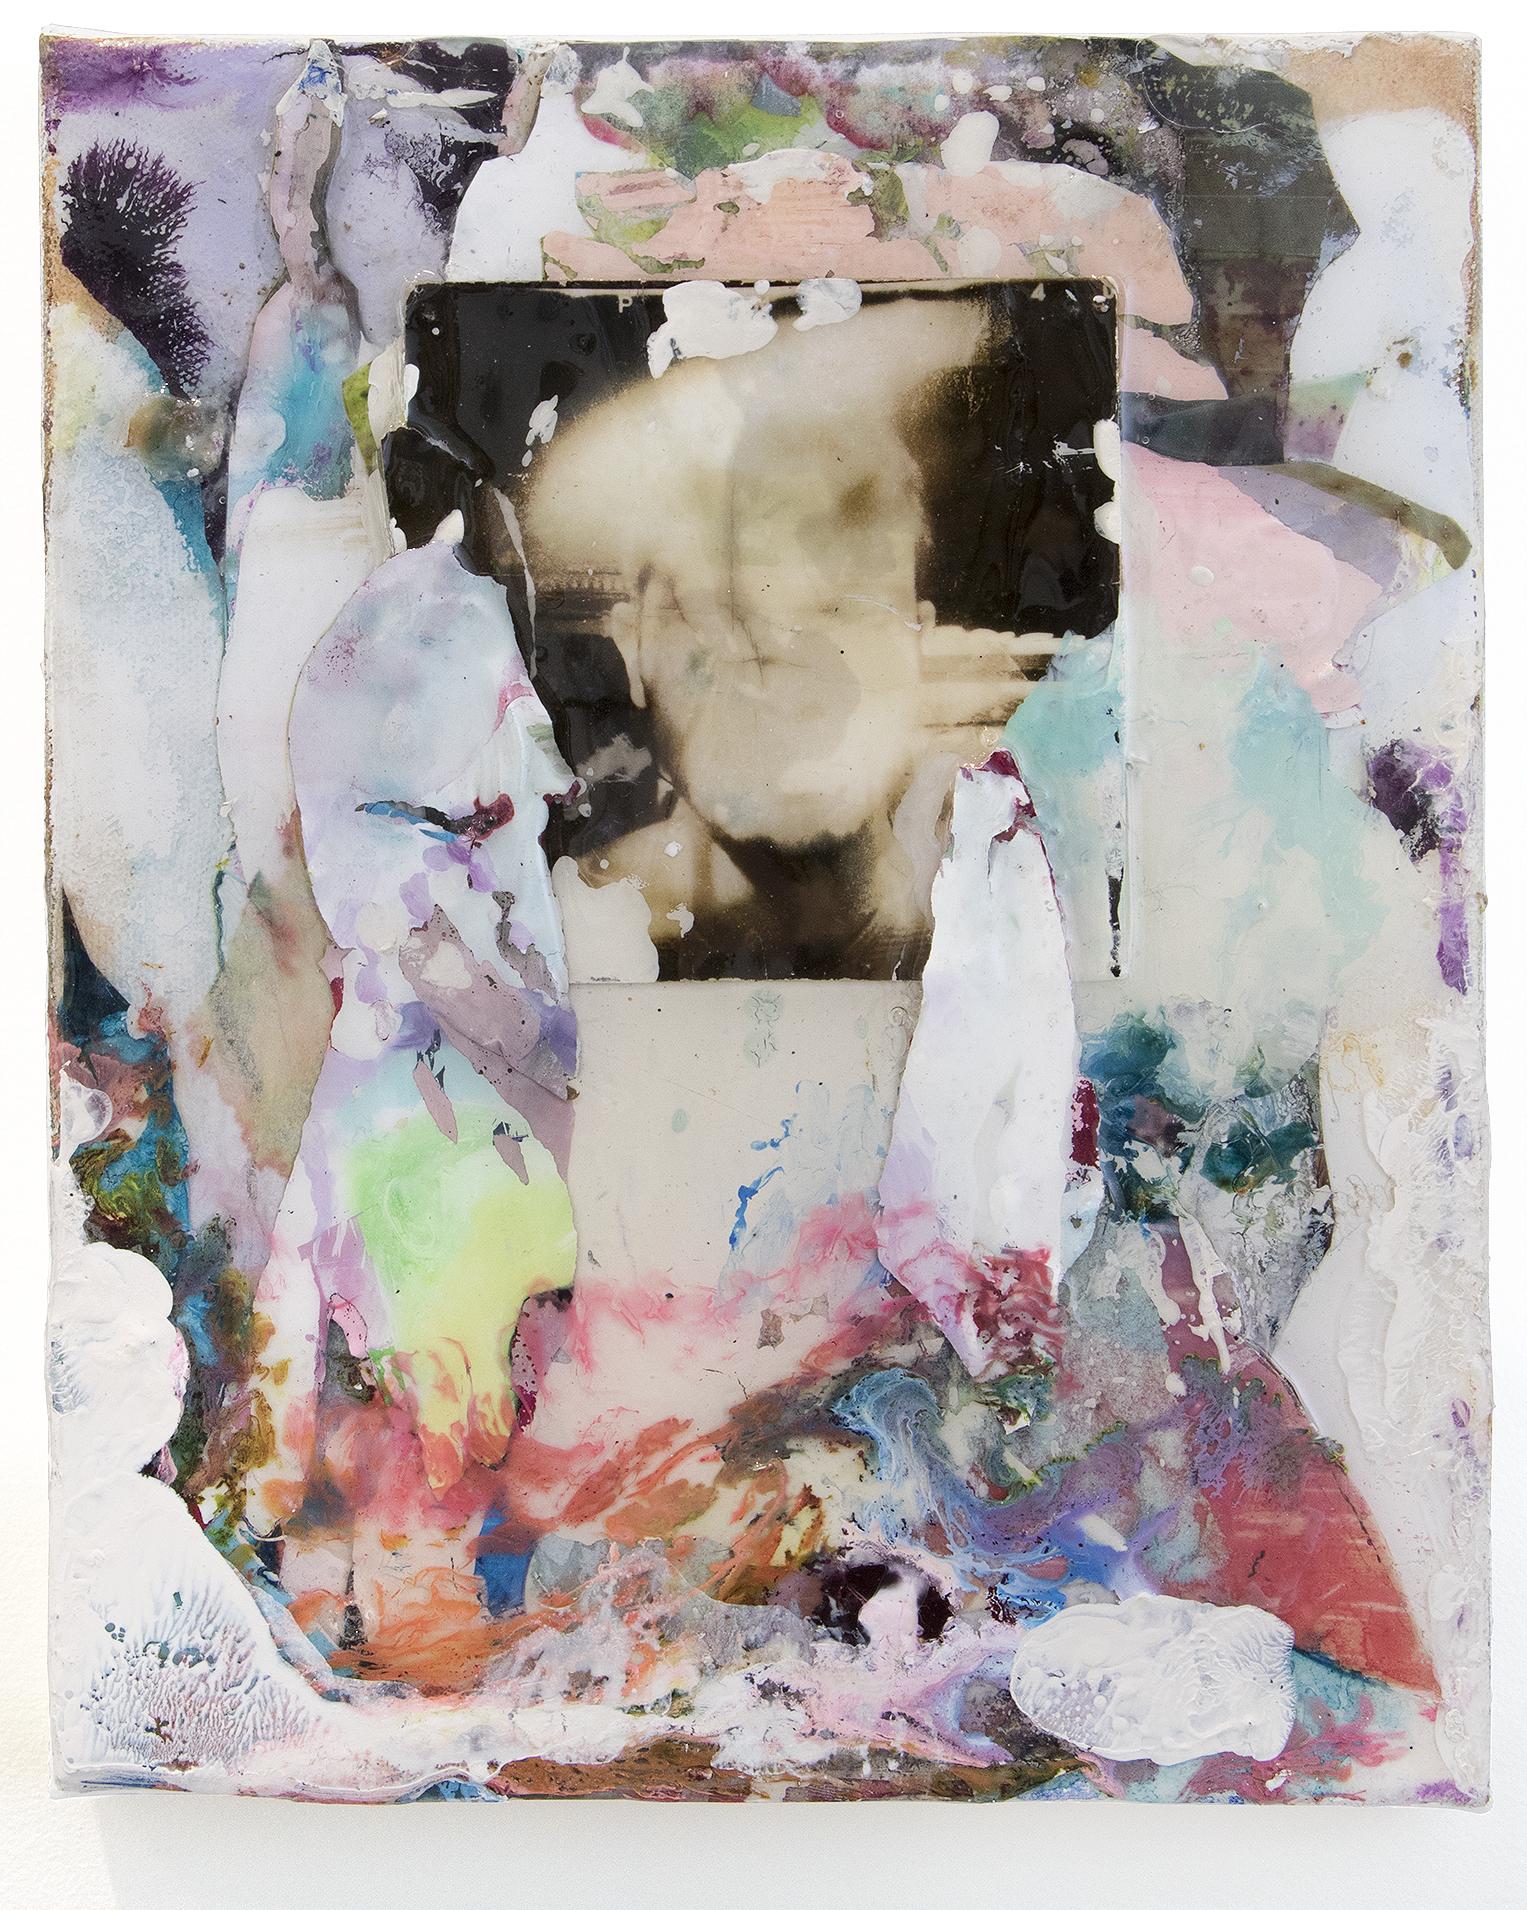 "Silex. Ink, acrylic, gelatin silver print, inkjet transparencies, epoxy resin on canvas. 8x10"". 2017"